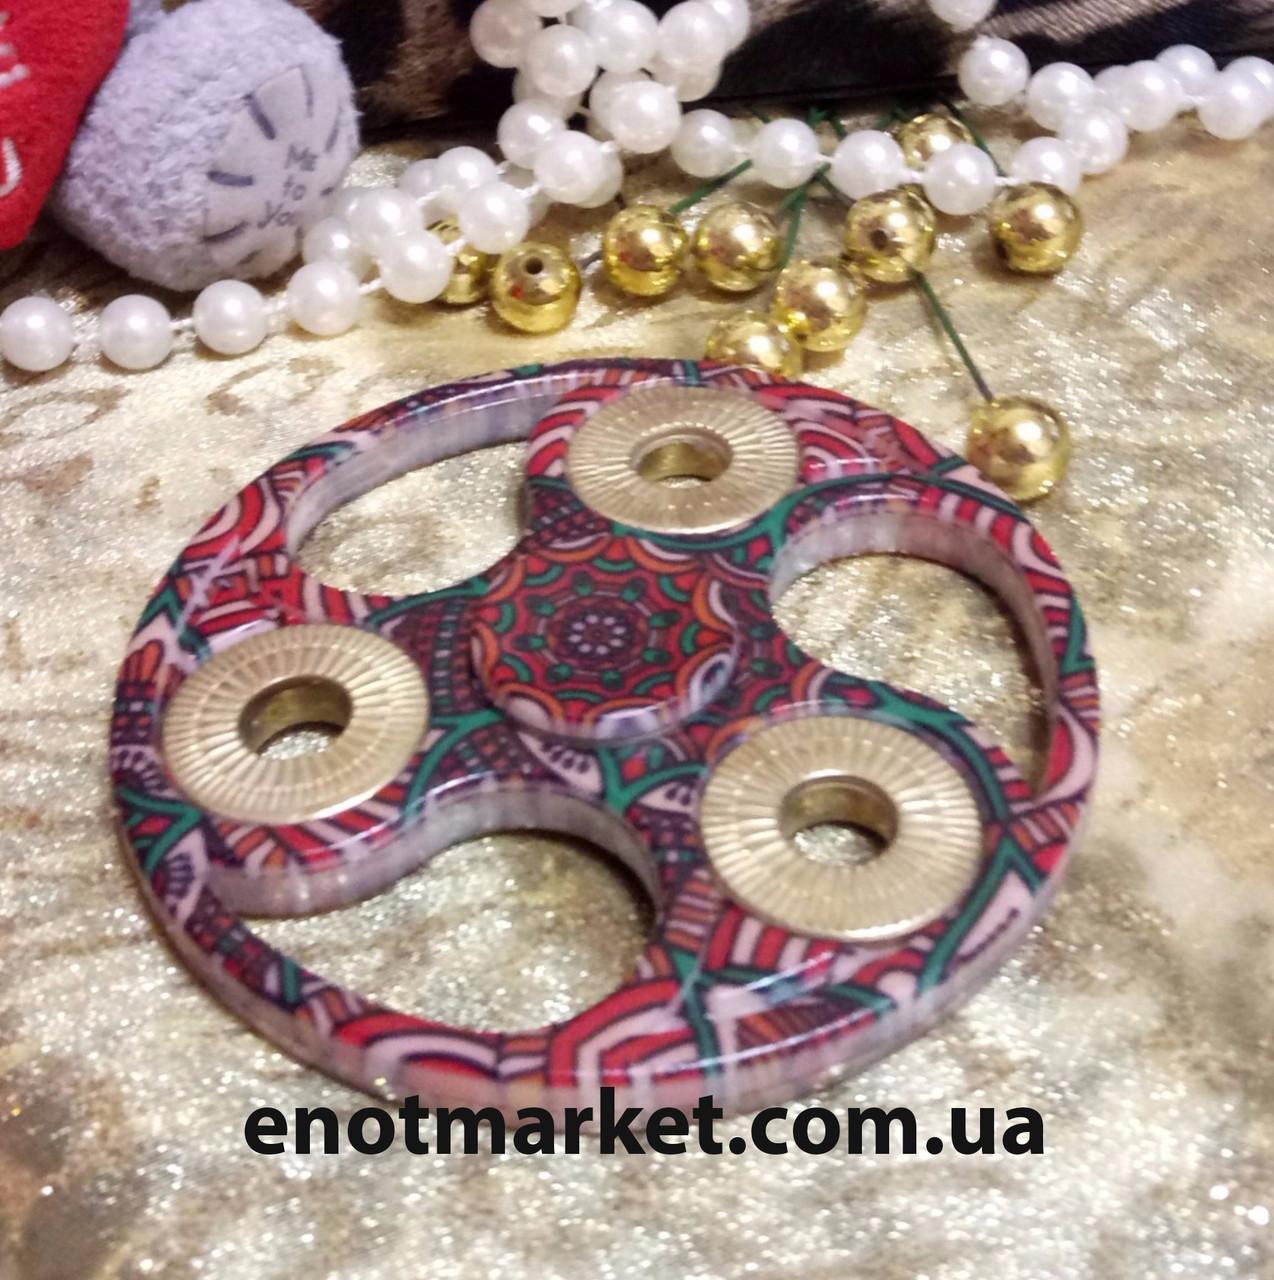 Спиннер, вертушка, крутилка для рук, finger spinner, hand spinner, spinner fidget toys керамический цветной